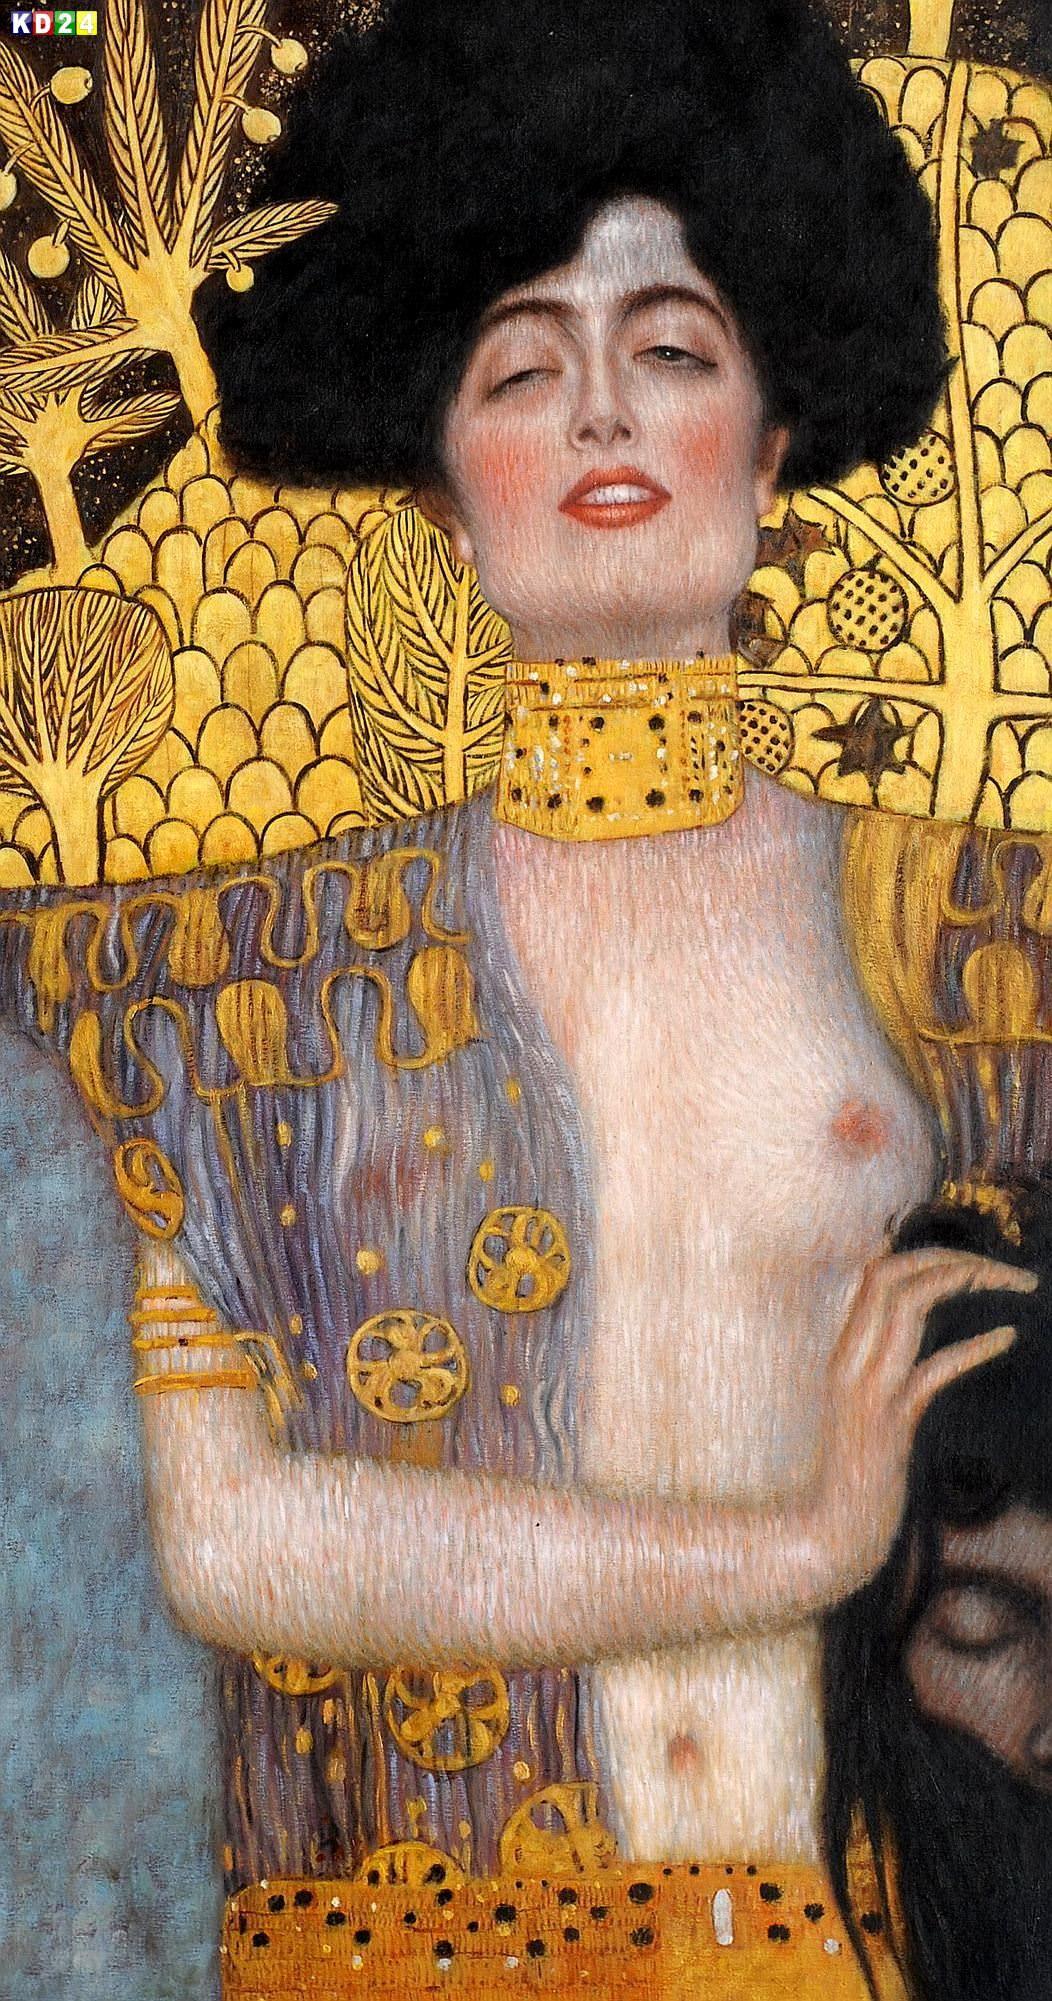 gustav klimt - Google Search | PRJ Images | Pinterest | Klimt